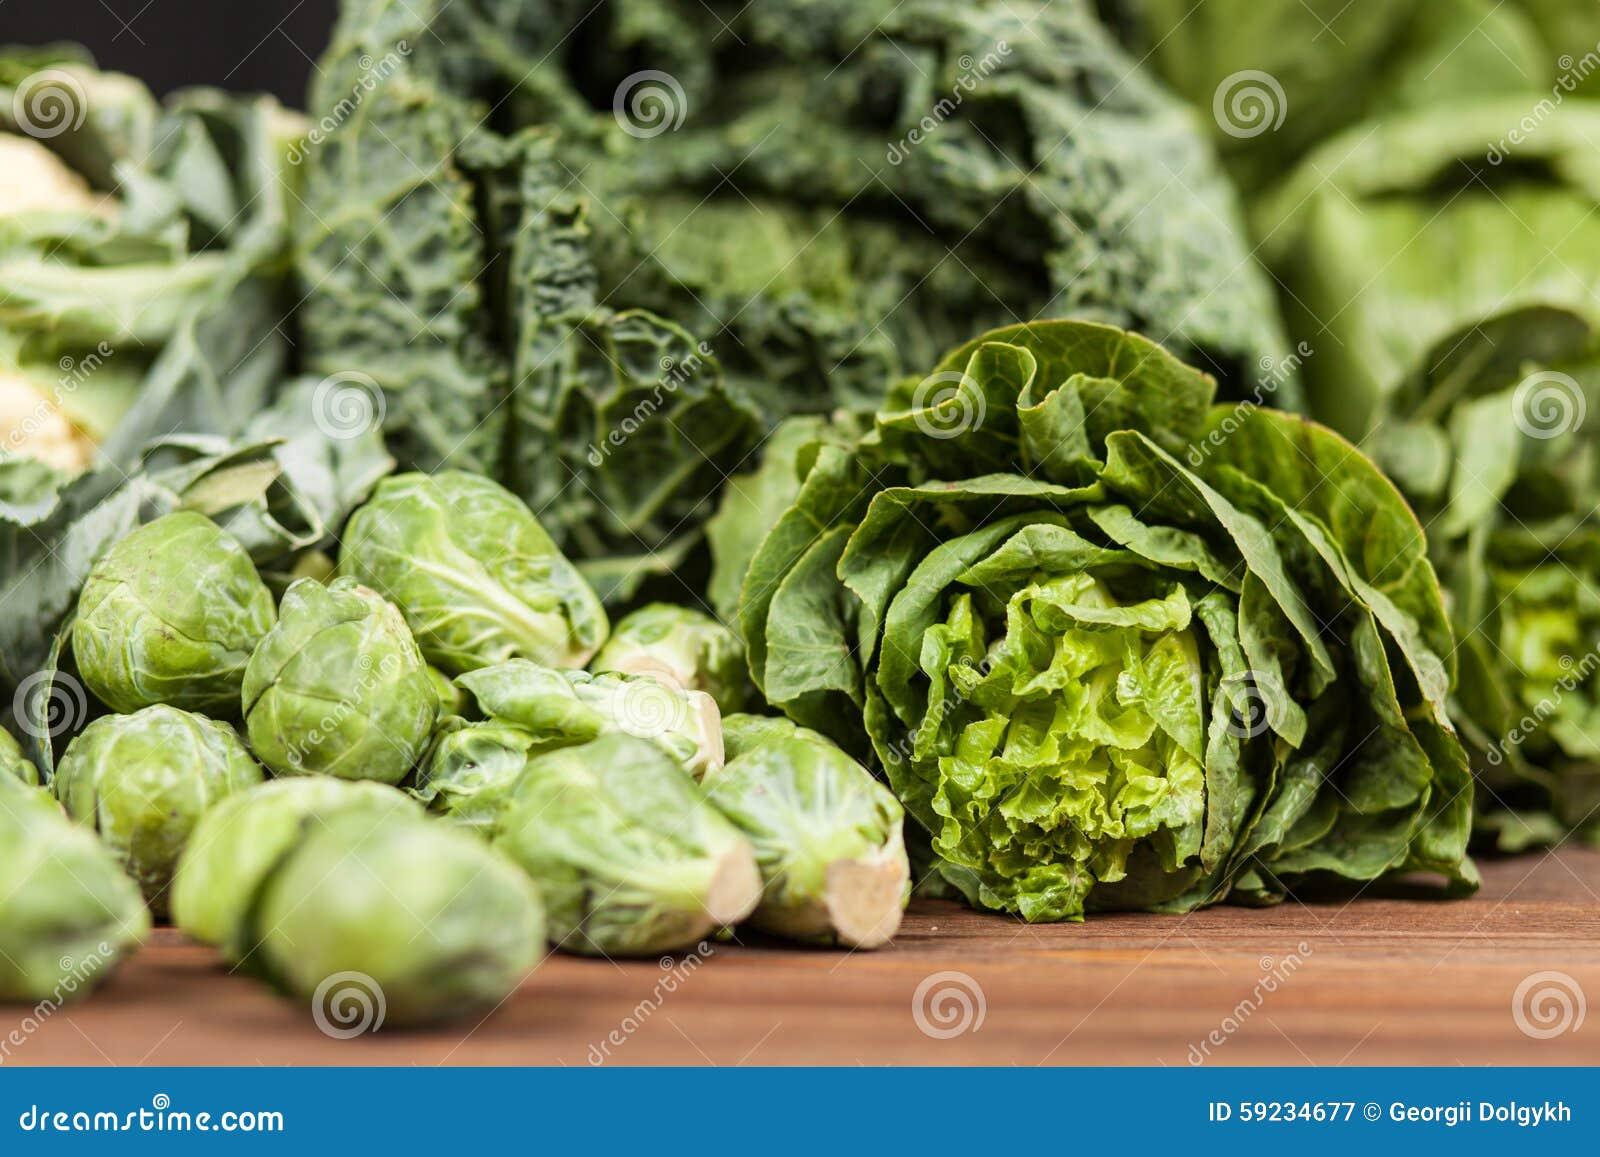 Download Surtido de verduras verdes imagen de archivo. Imagen de cosecha - 59234677